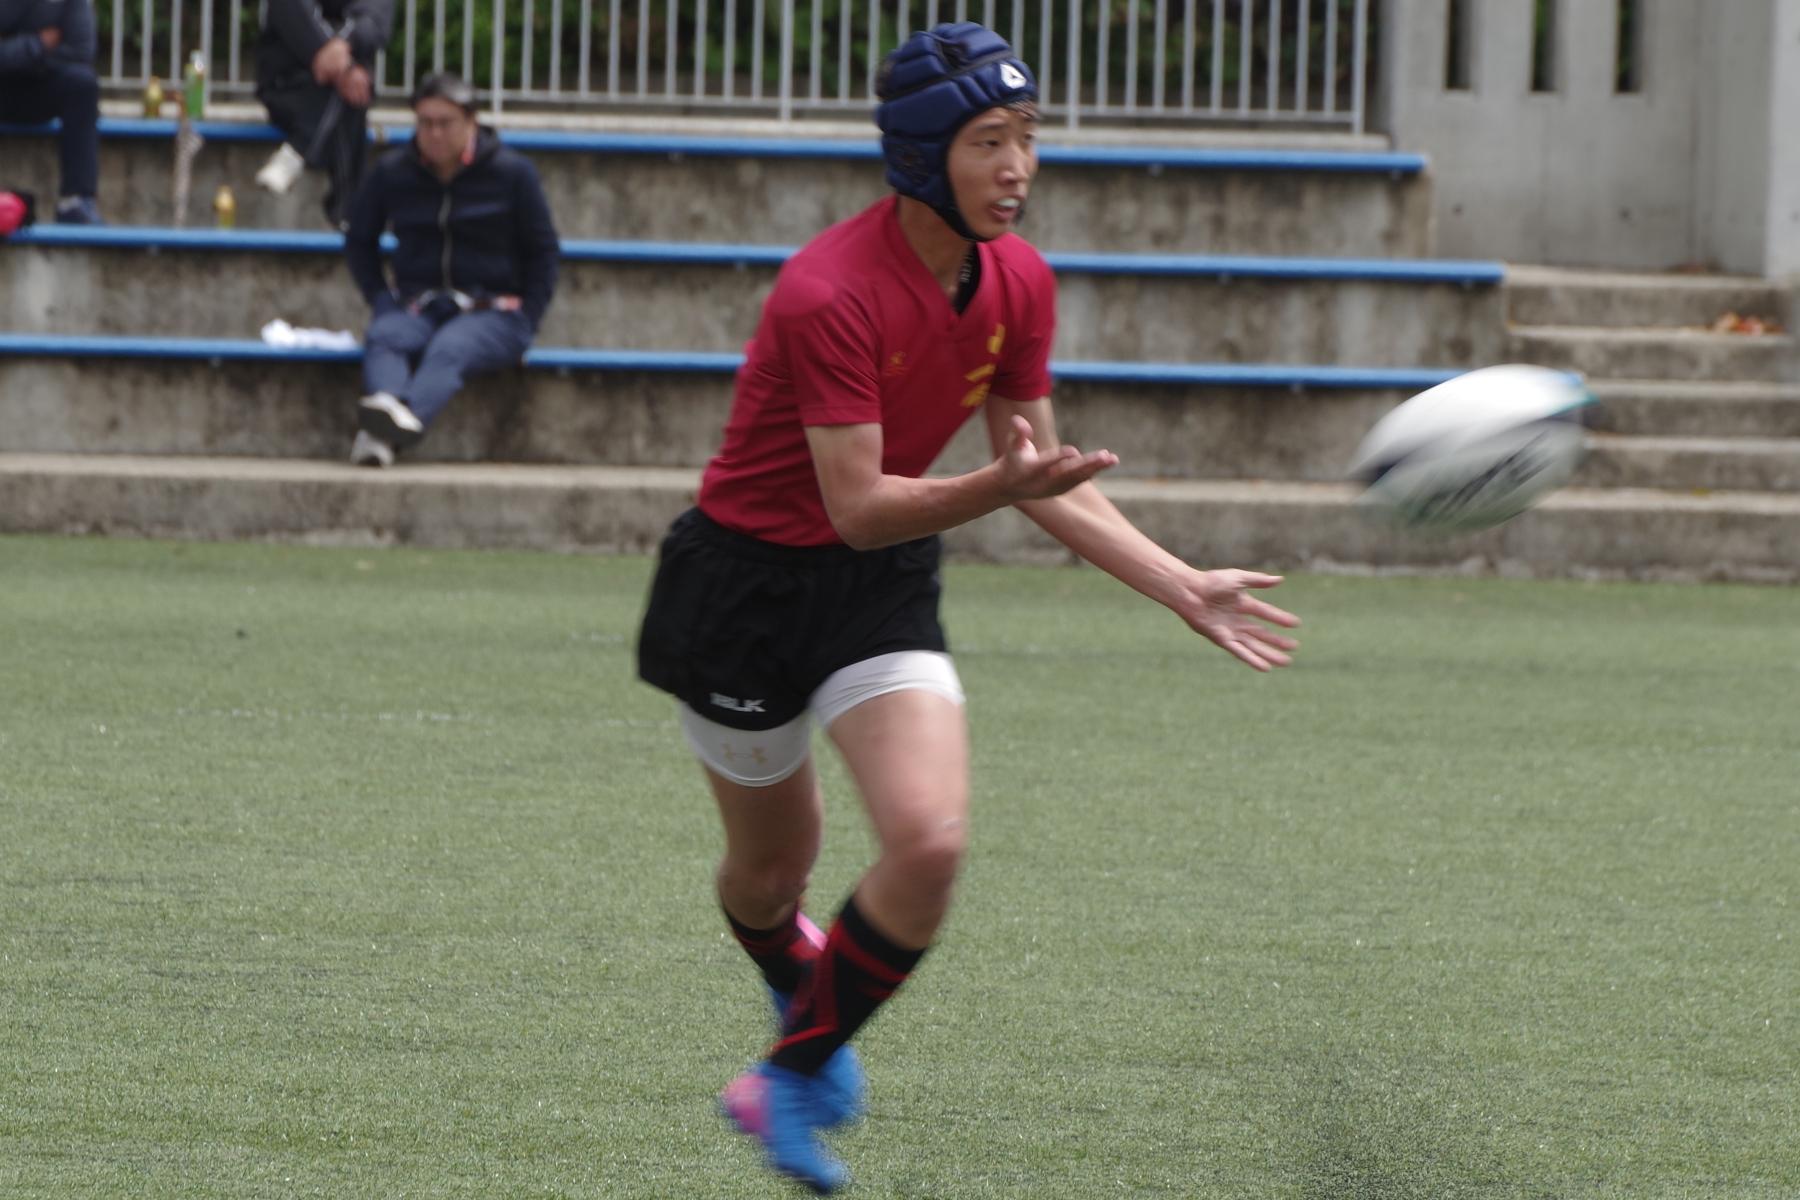 http://kokura-rugby.sakura.ne.jp/180415_122604.jpg